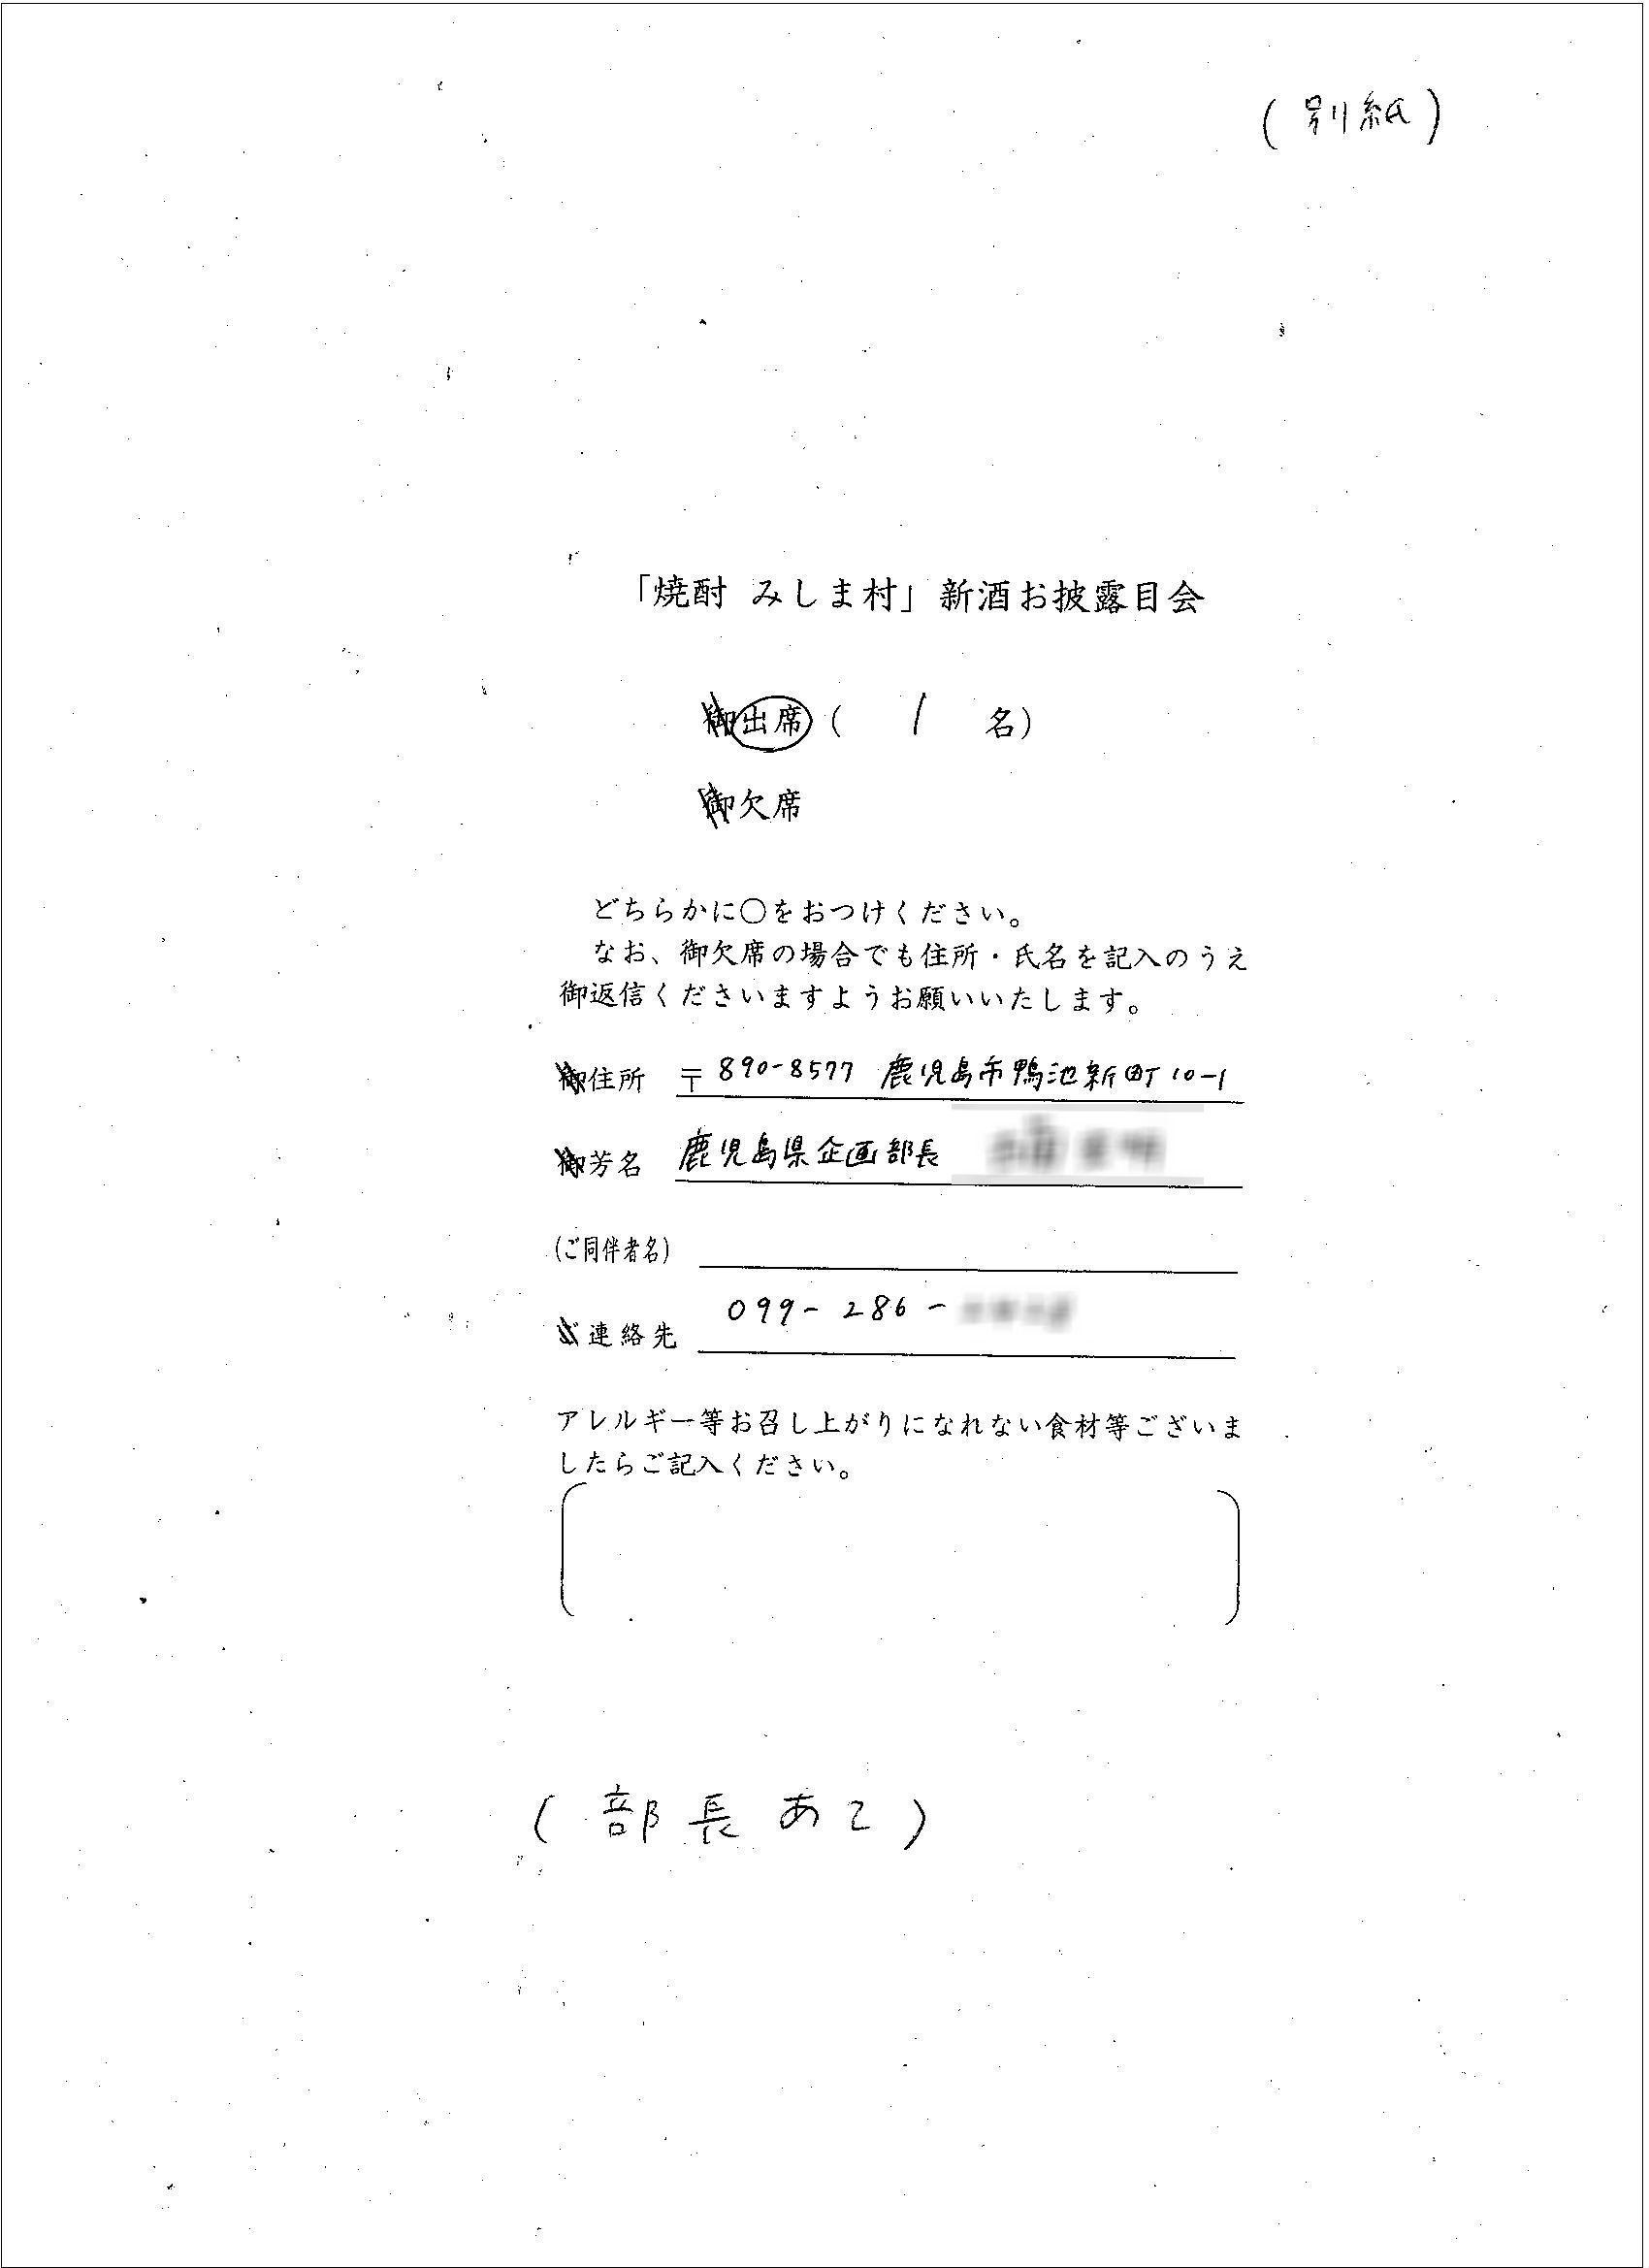 http://hunter-investigate.jp/news/731bdeb0b8f27906d9dedc62f7974c45a42c6bc0.jpg